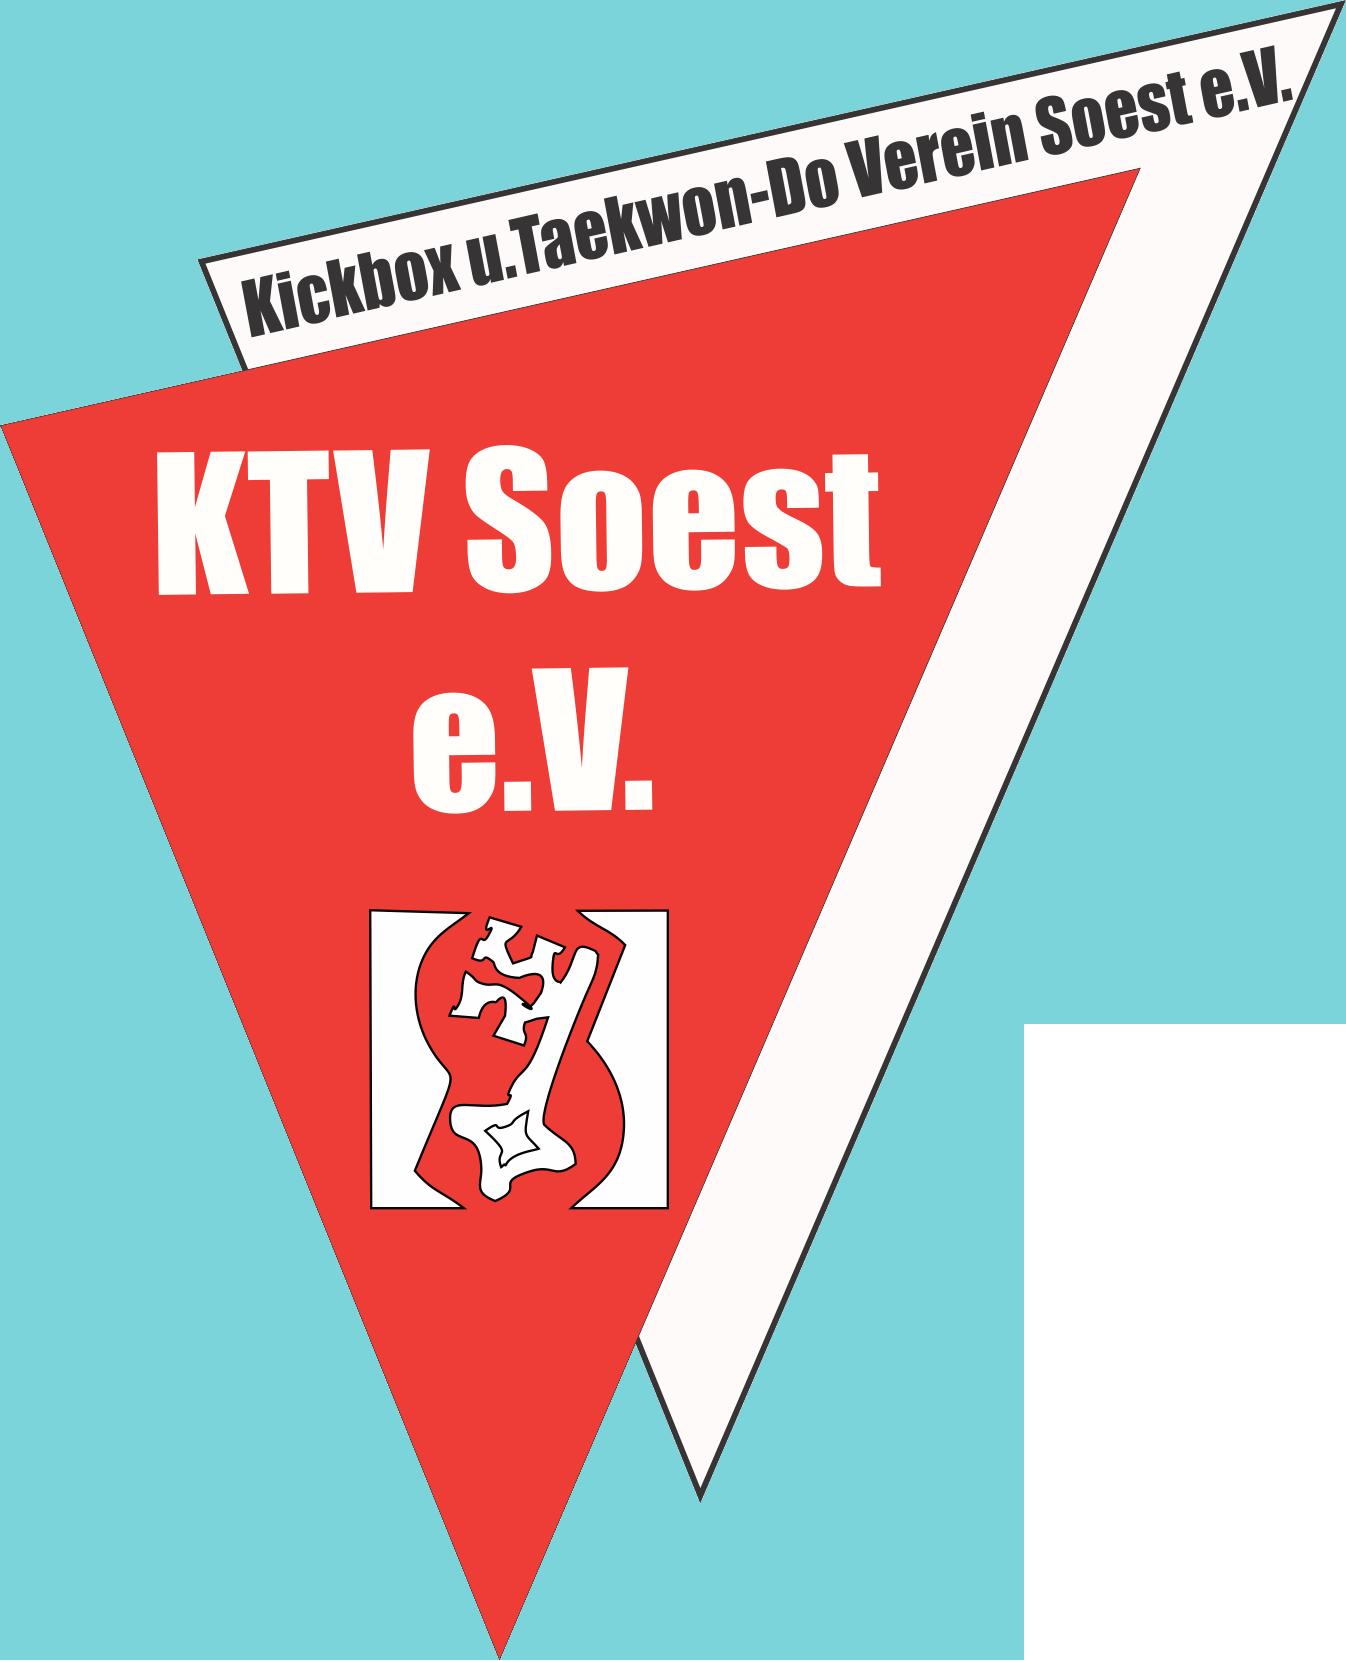 KTV Soest